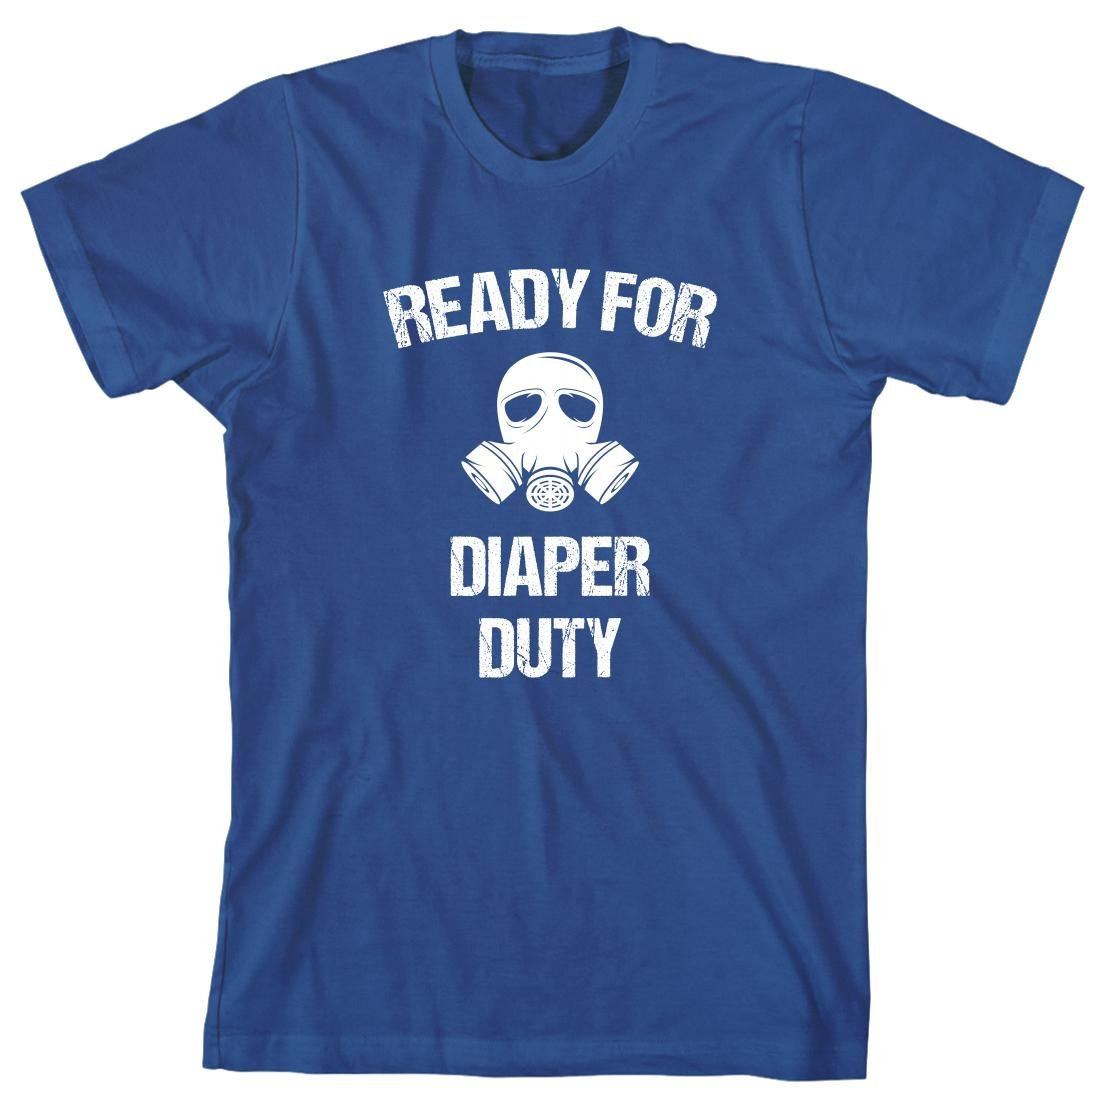 5563842c4 ... Diaper Duty Shirt - https://etsy.me/2DiWA6f #clothing #dadtobe  #newdadshirt #fathersdaygift #newborn #newdadoftwins #babyrevealparty  #rookiedad #newdad ...